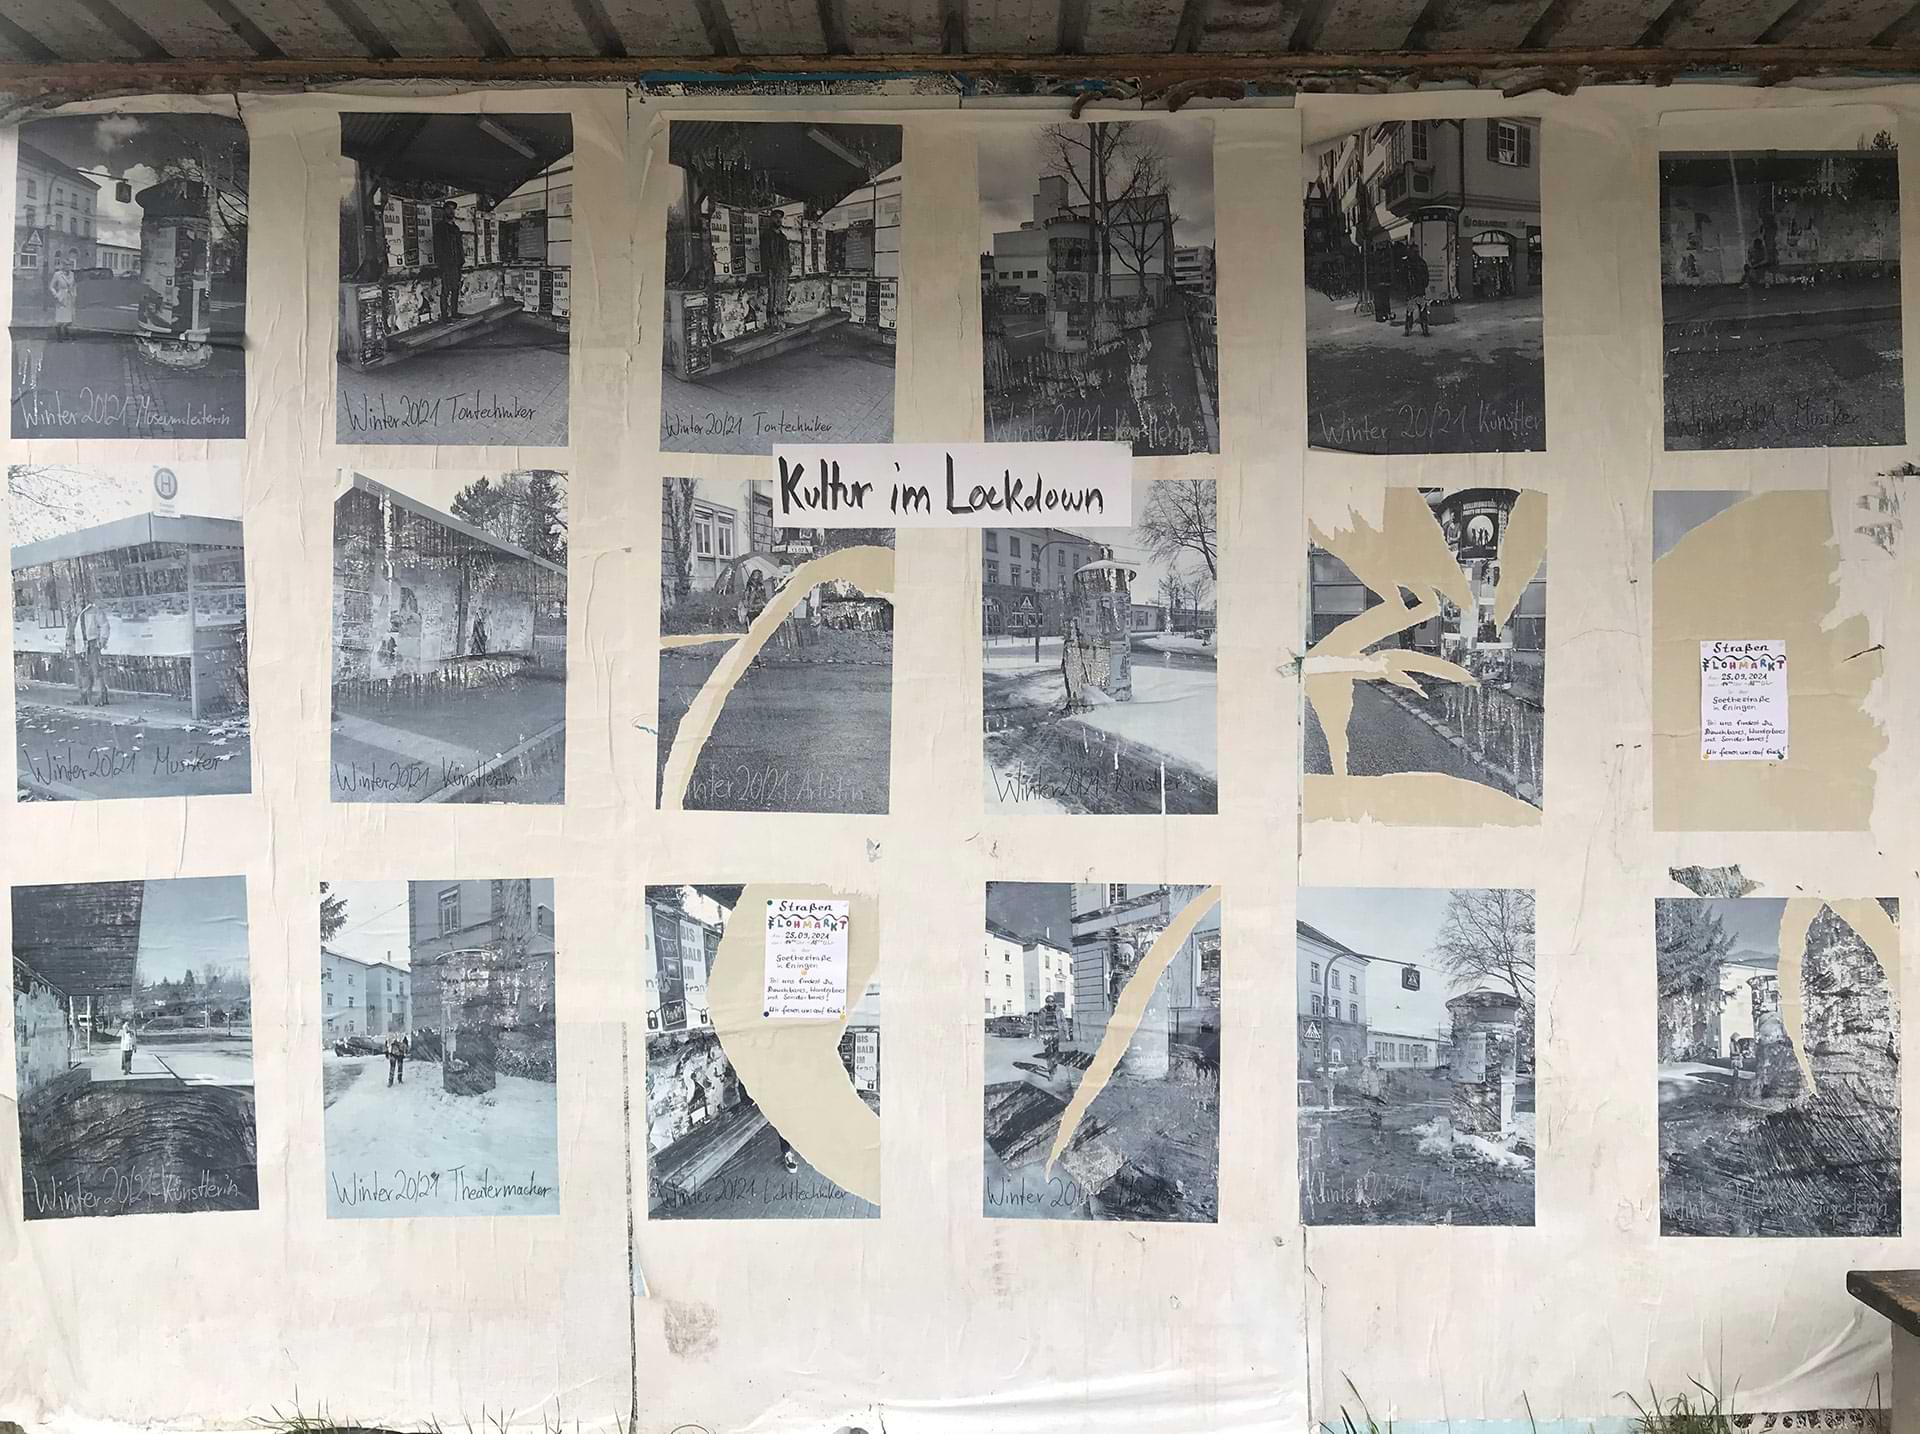 christianehaag-winter20-21-kunst-art-kulturimlockdown-postercolumn-photoproject